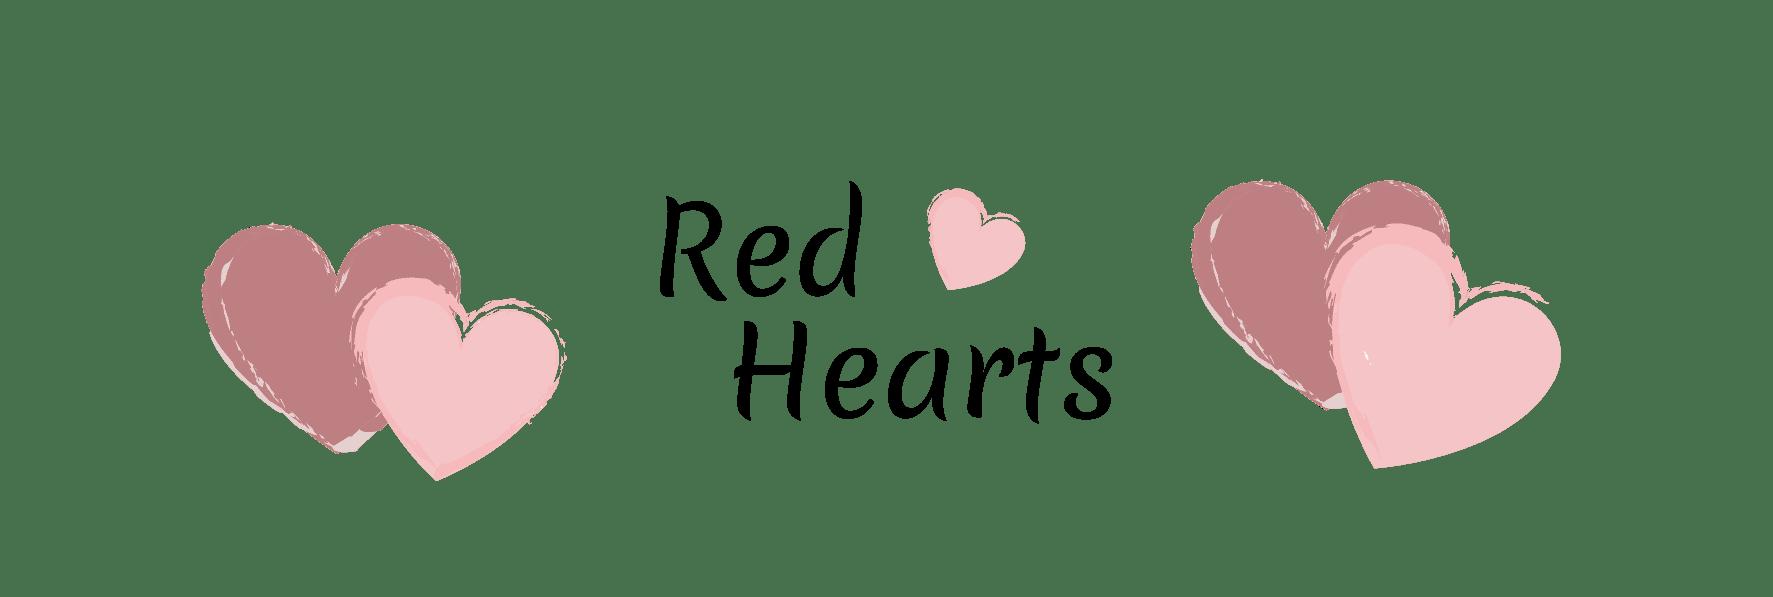 Kollektion Red Hearts